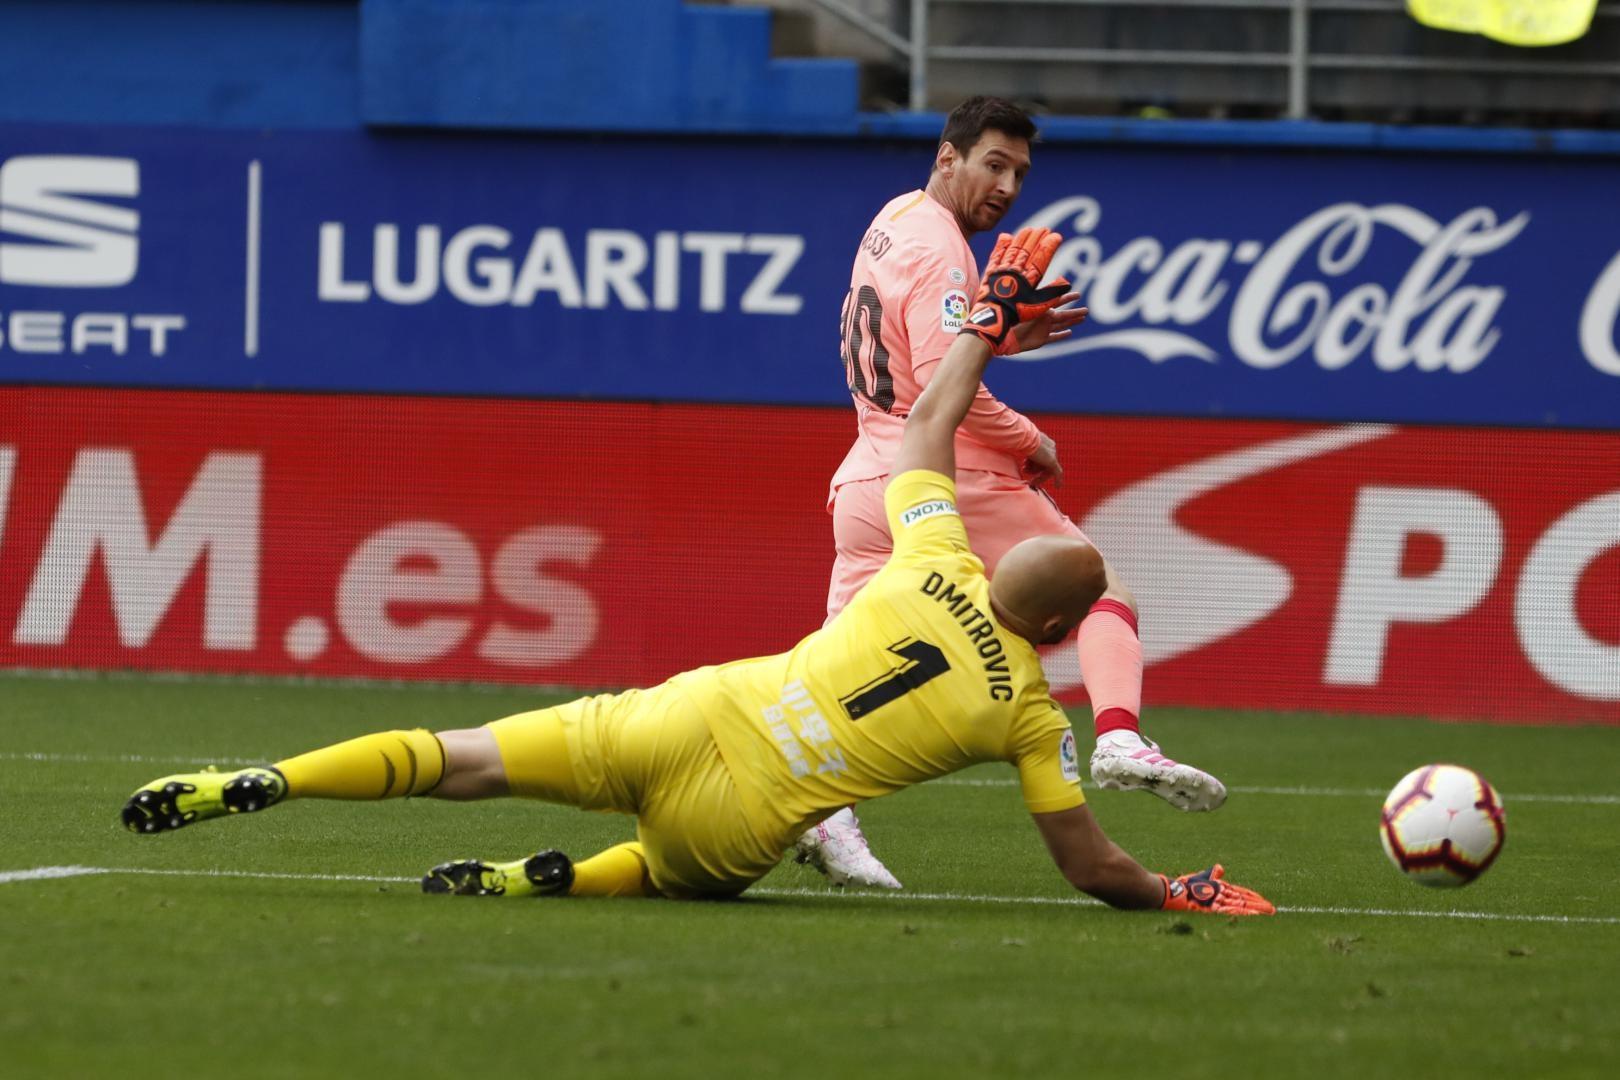 Barcelona cerró con empate la Liga. Foto: Barcelona